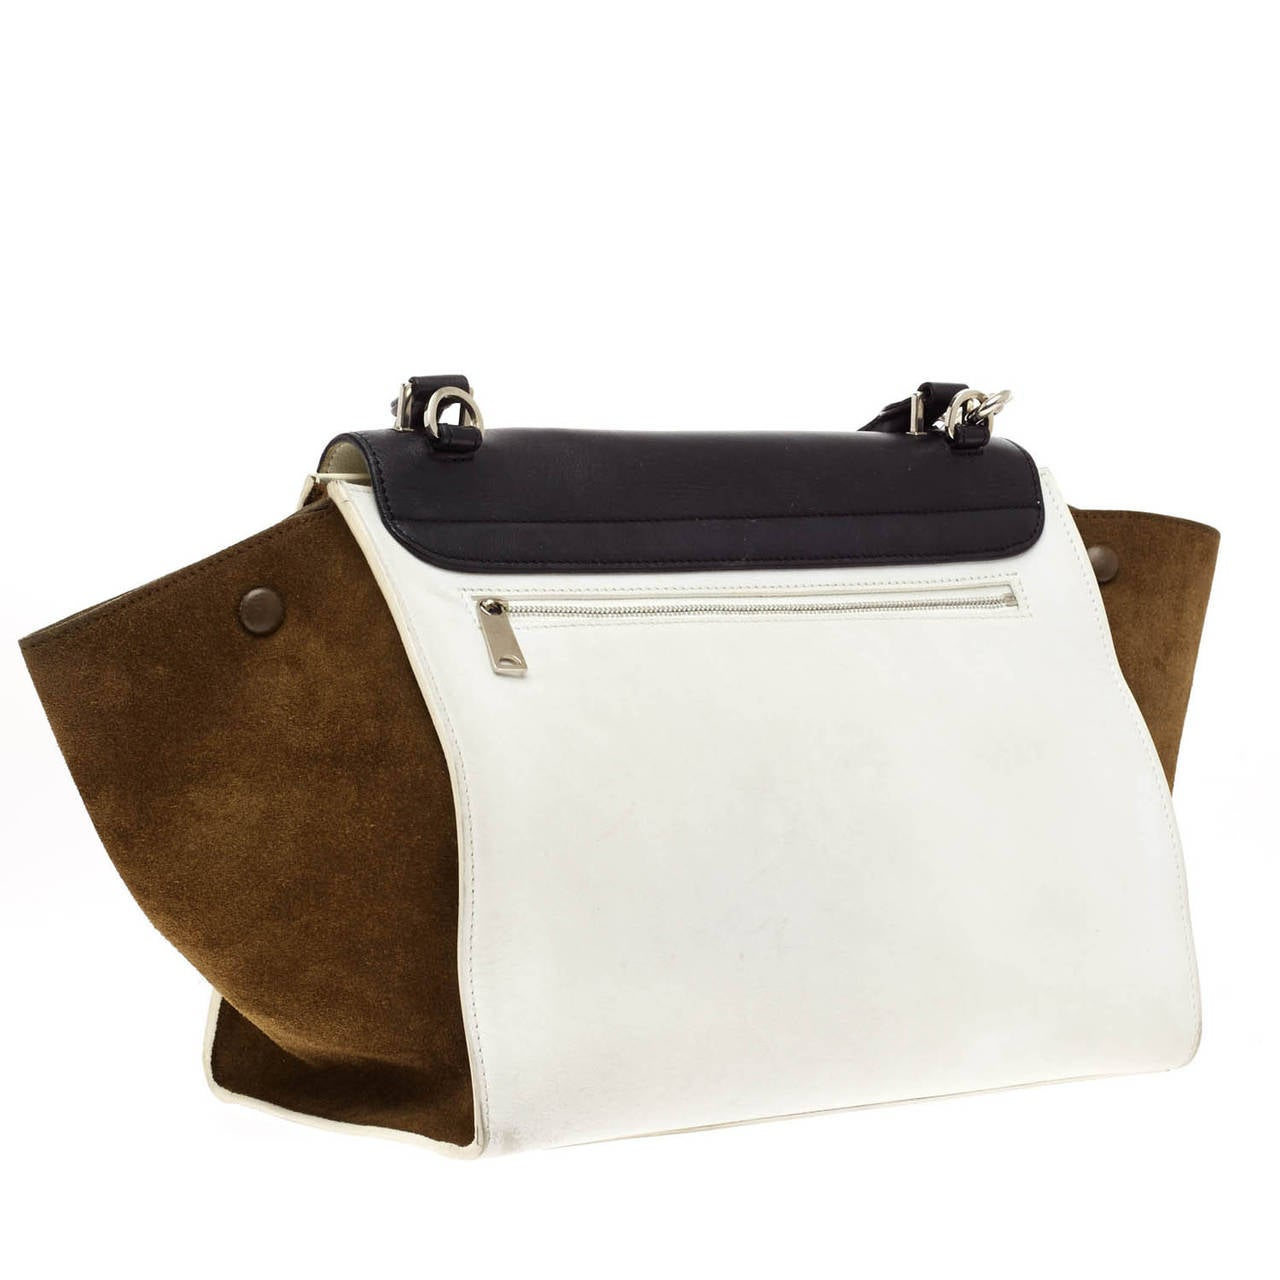 celine green suede phantom bag - celine medium tri-color trapeze, celine cabas tote bag price